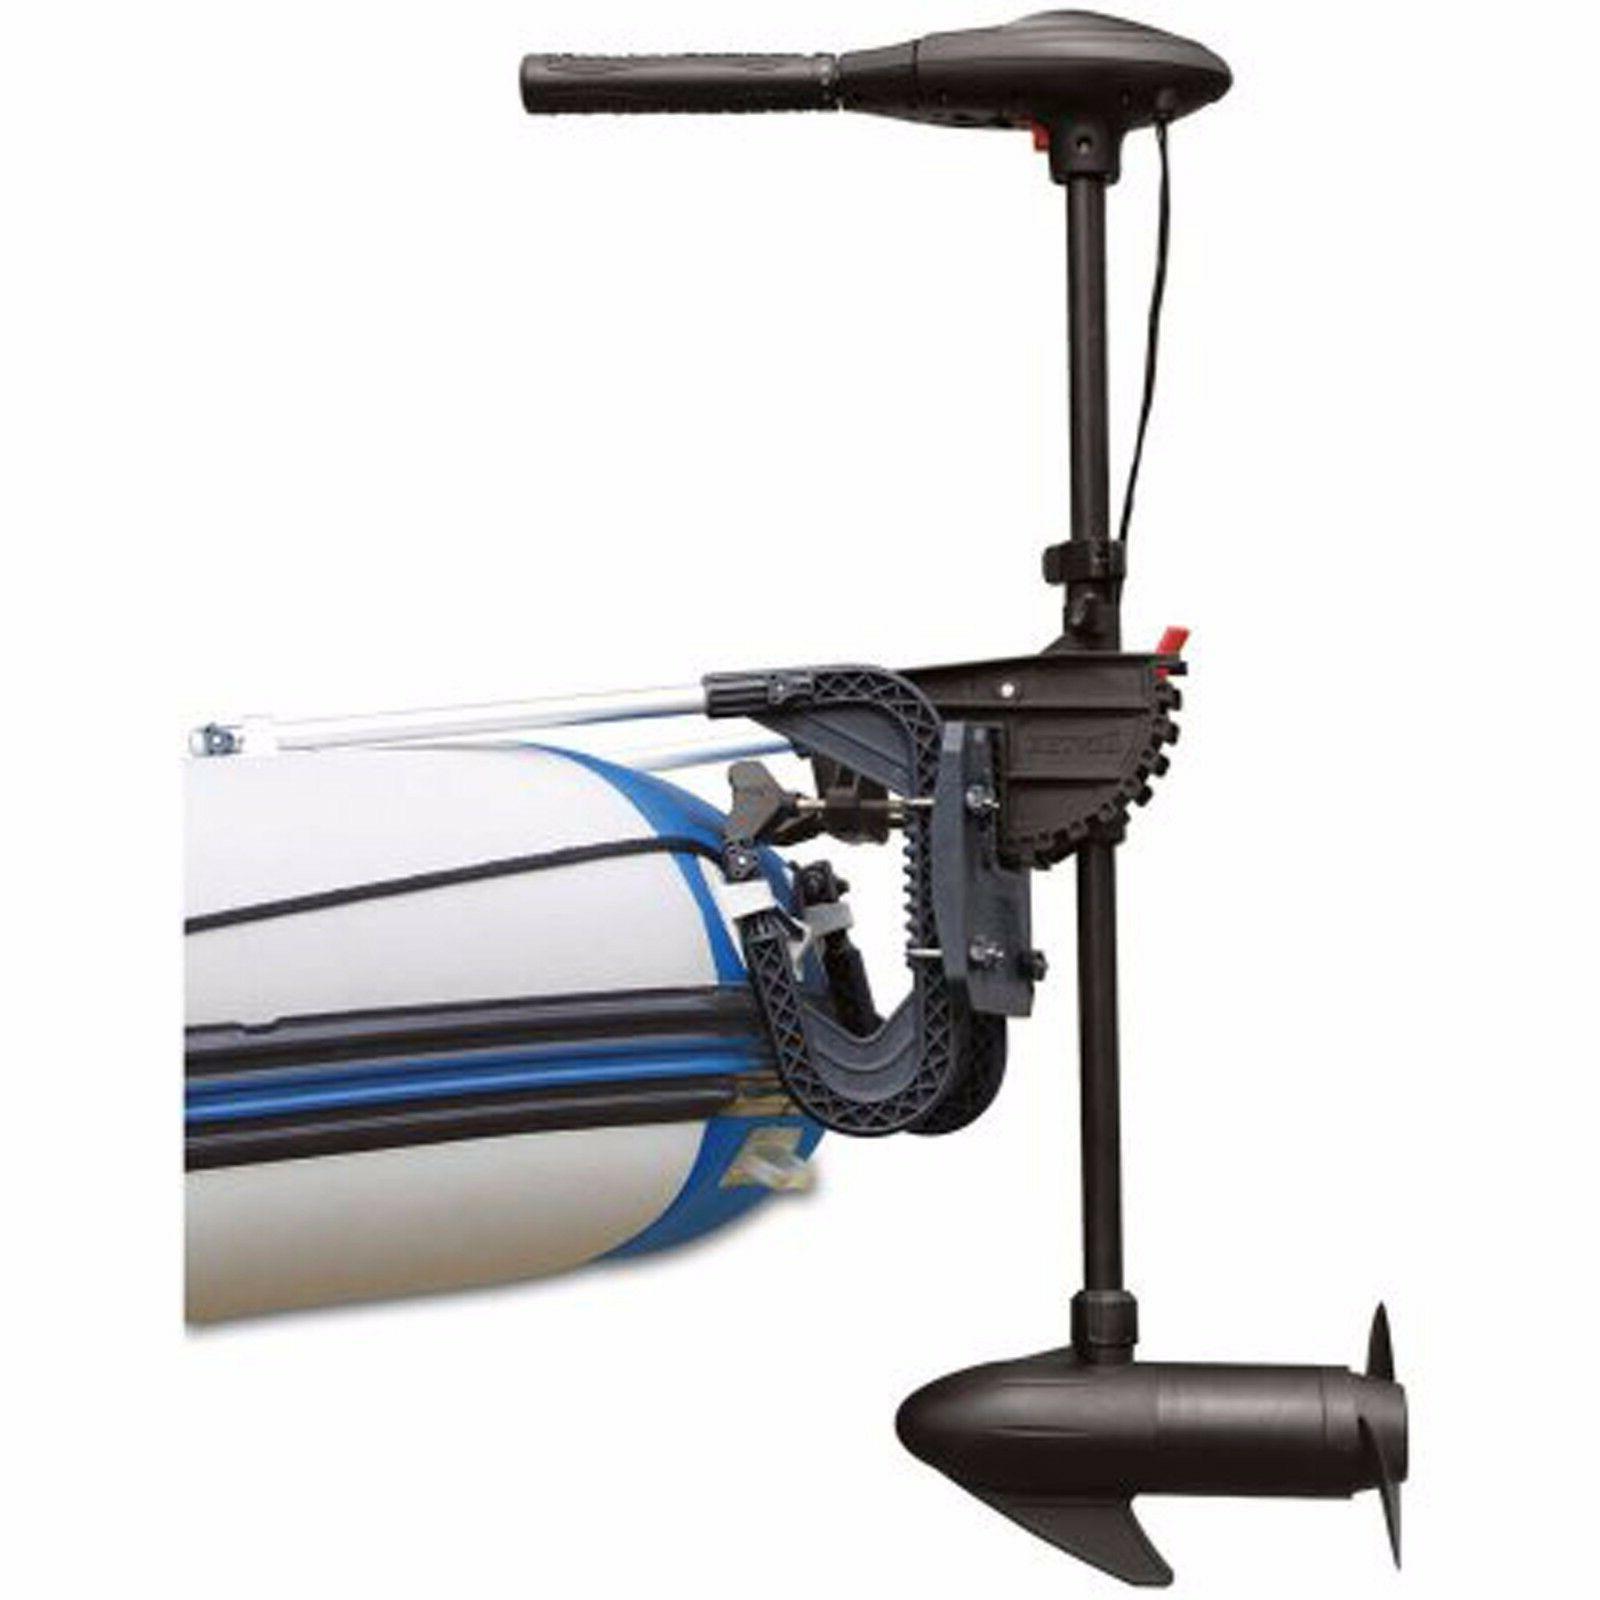 Trolling Motor For Intex Inflatable Boat 36 Shaft Adjustable